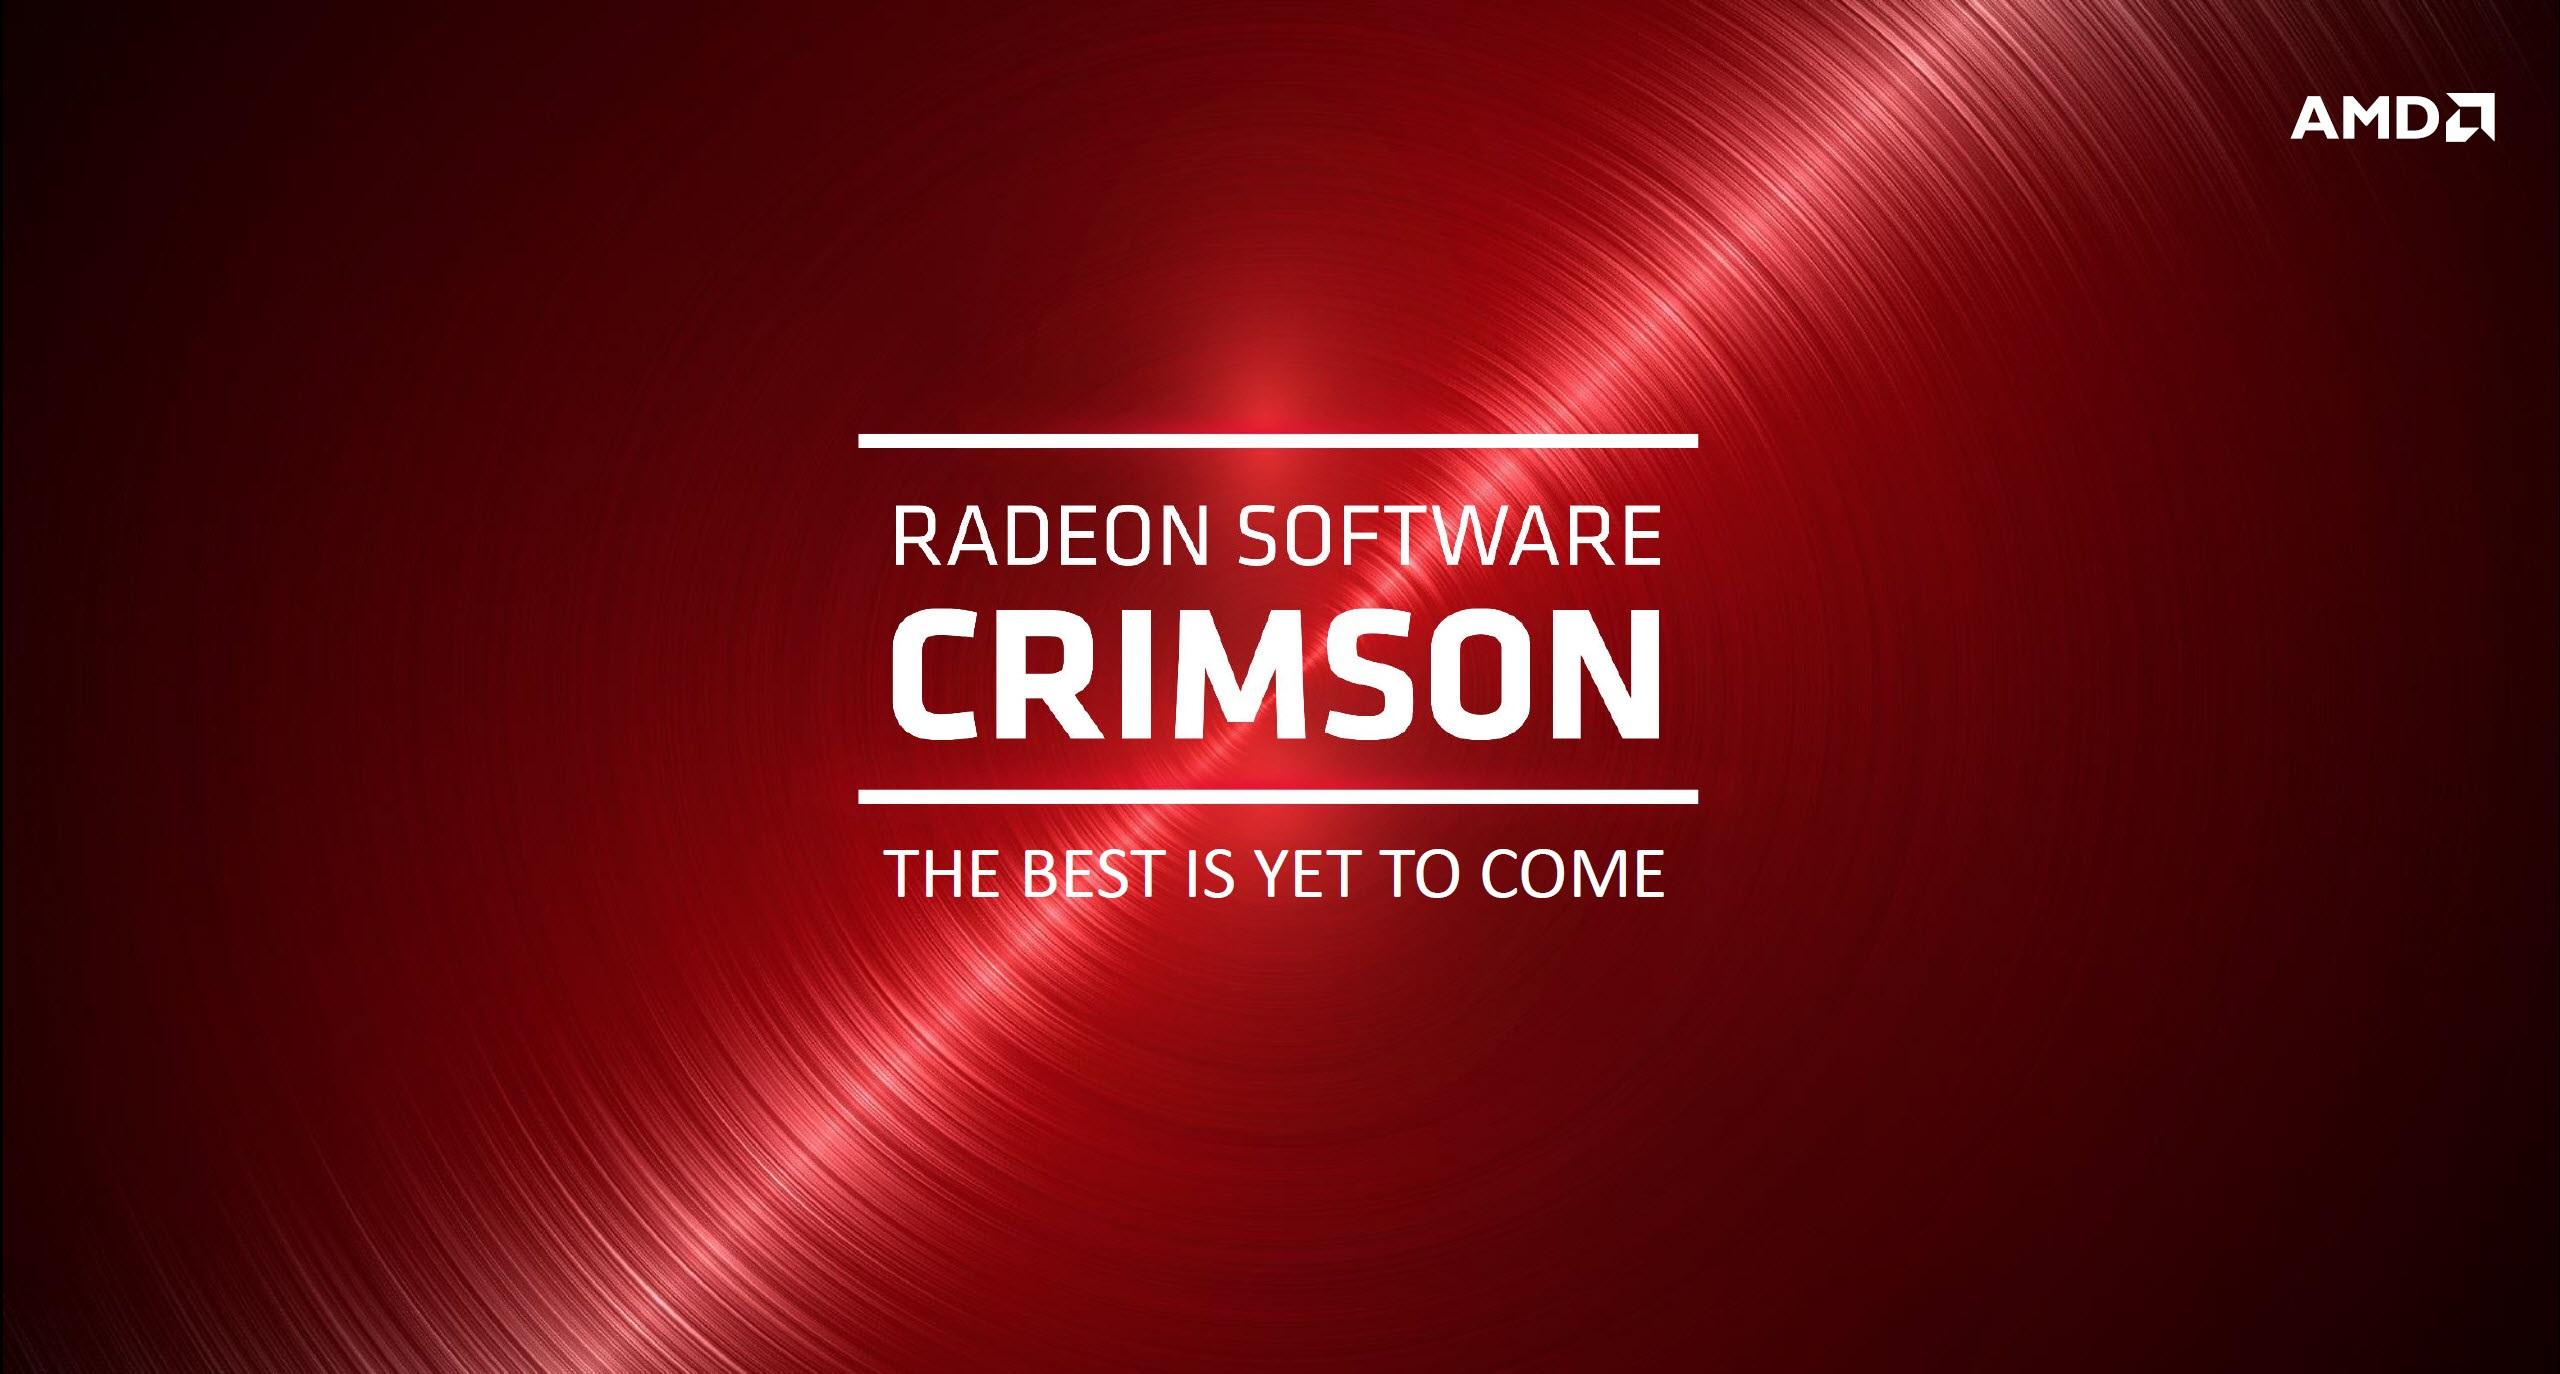 AMD Radeon Software Crimson Edition Drivers Officially